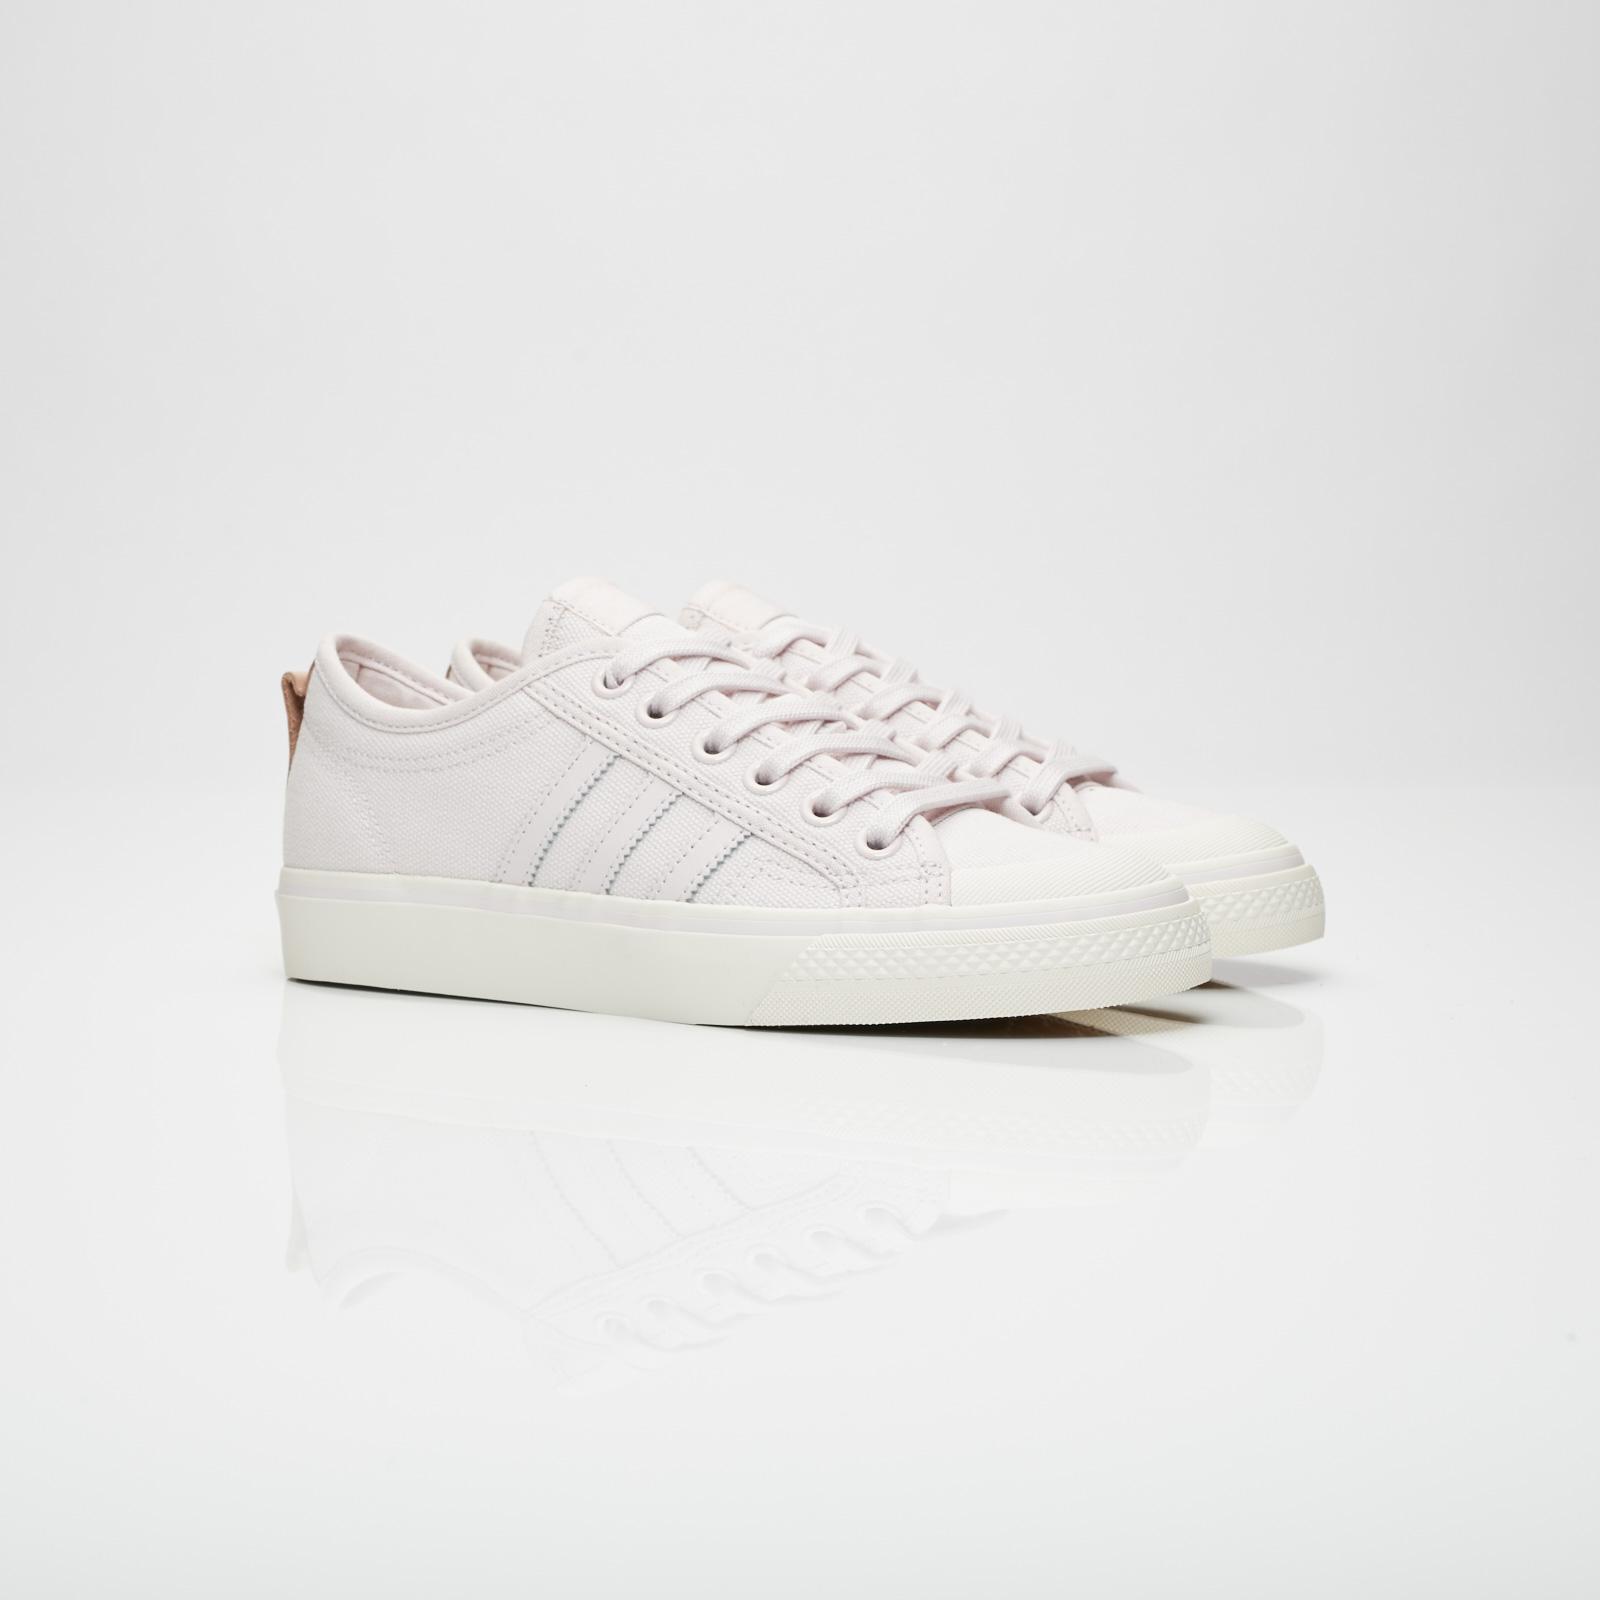 ba950f7a02aeba adidas Nizza Low Womens - Cq2531 - Sneakersnstuff